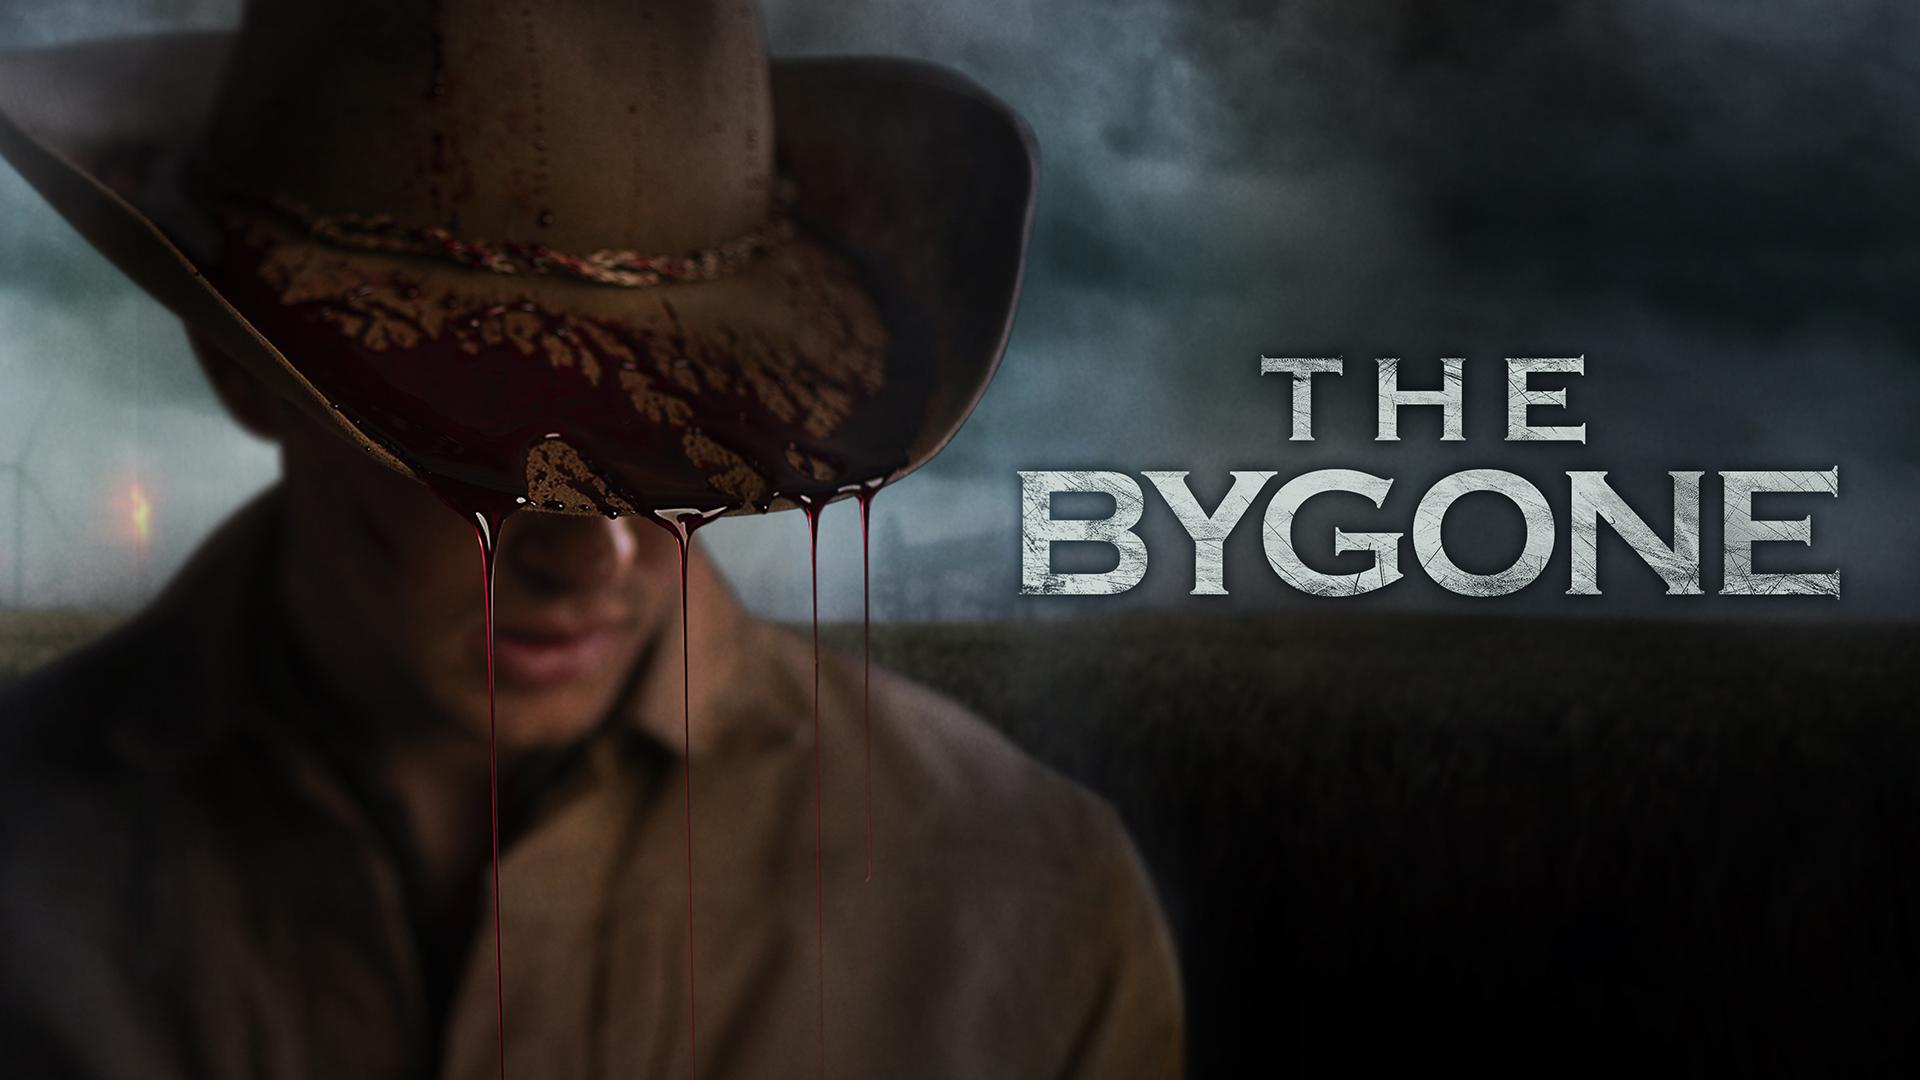 The Bygone